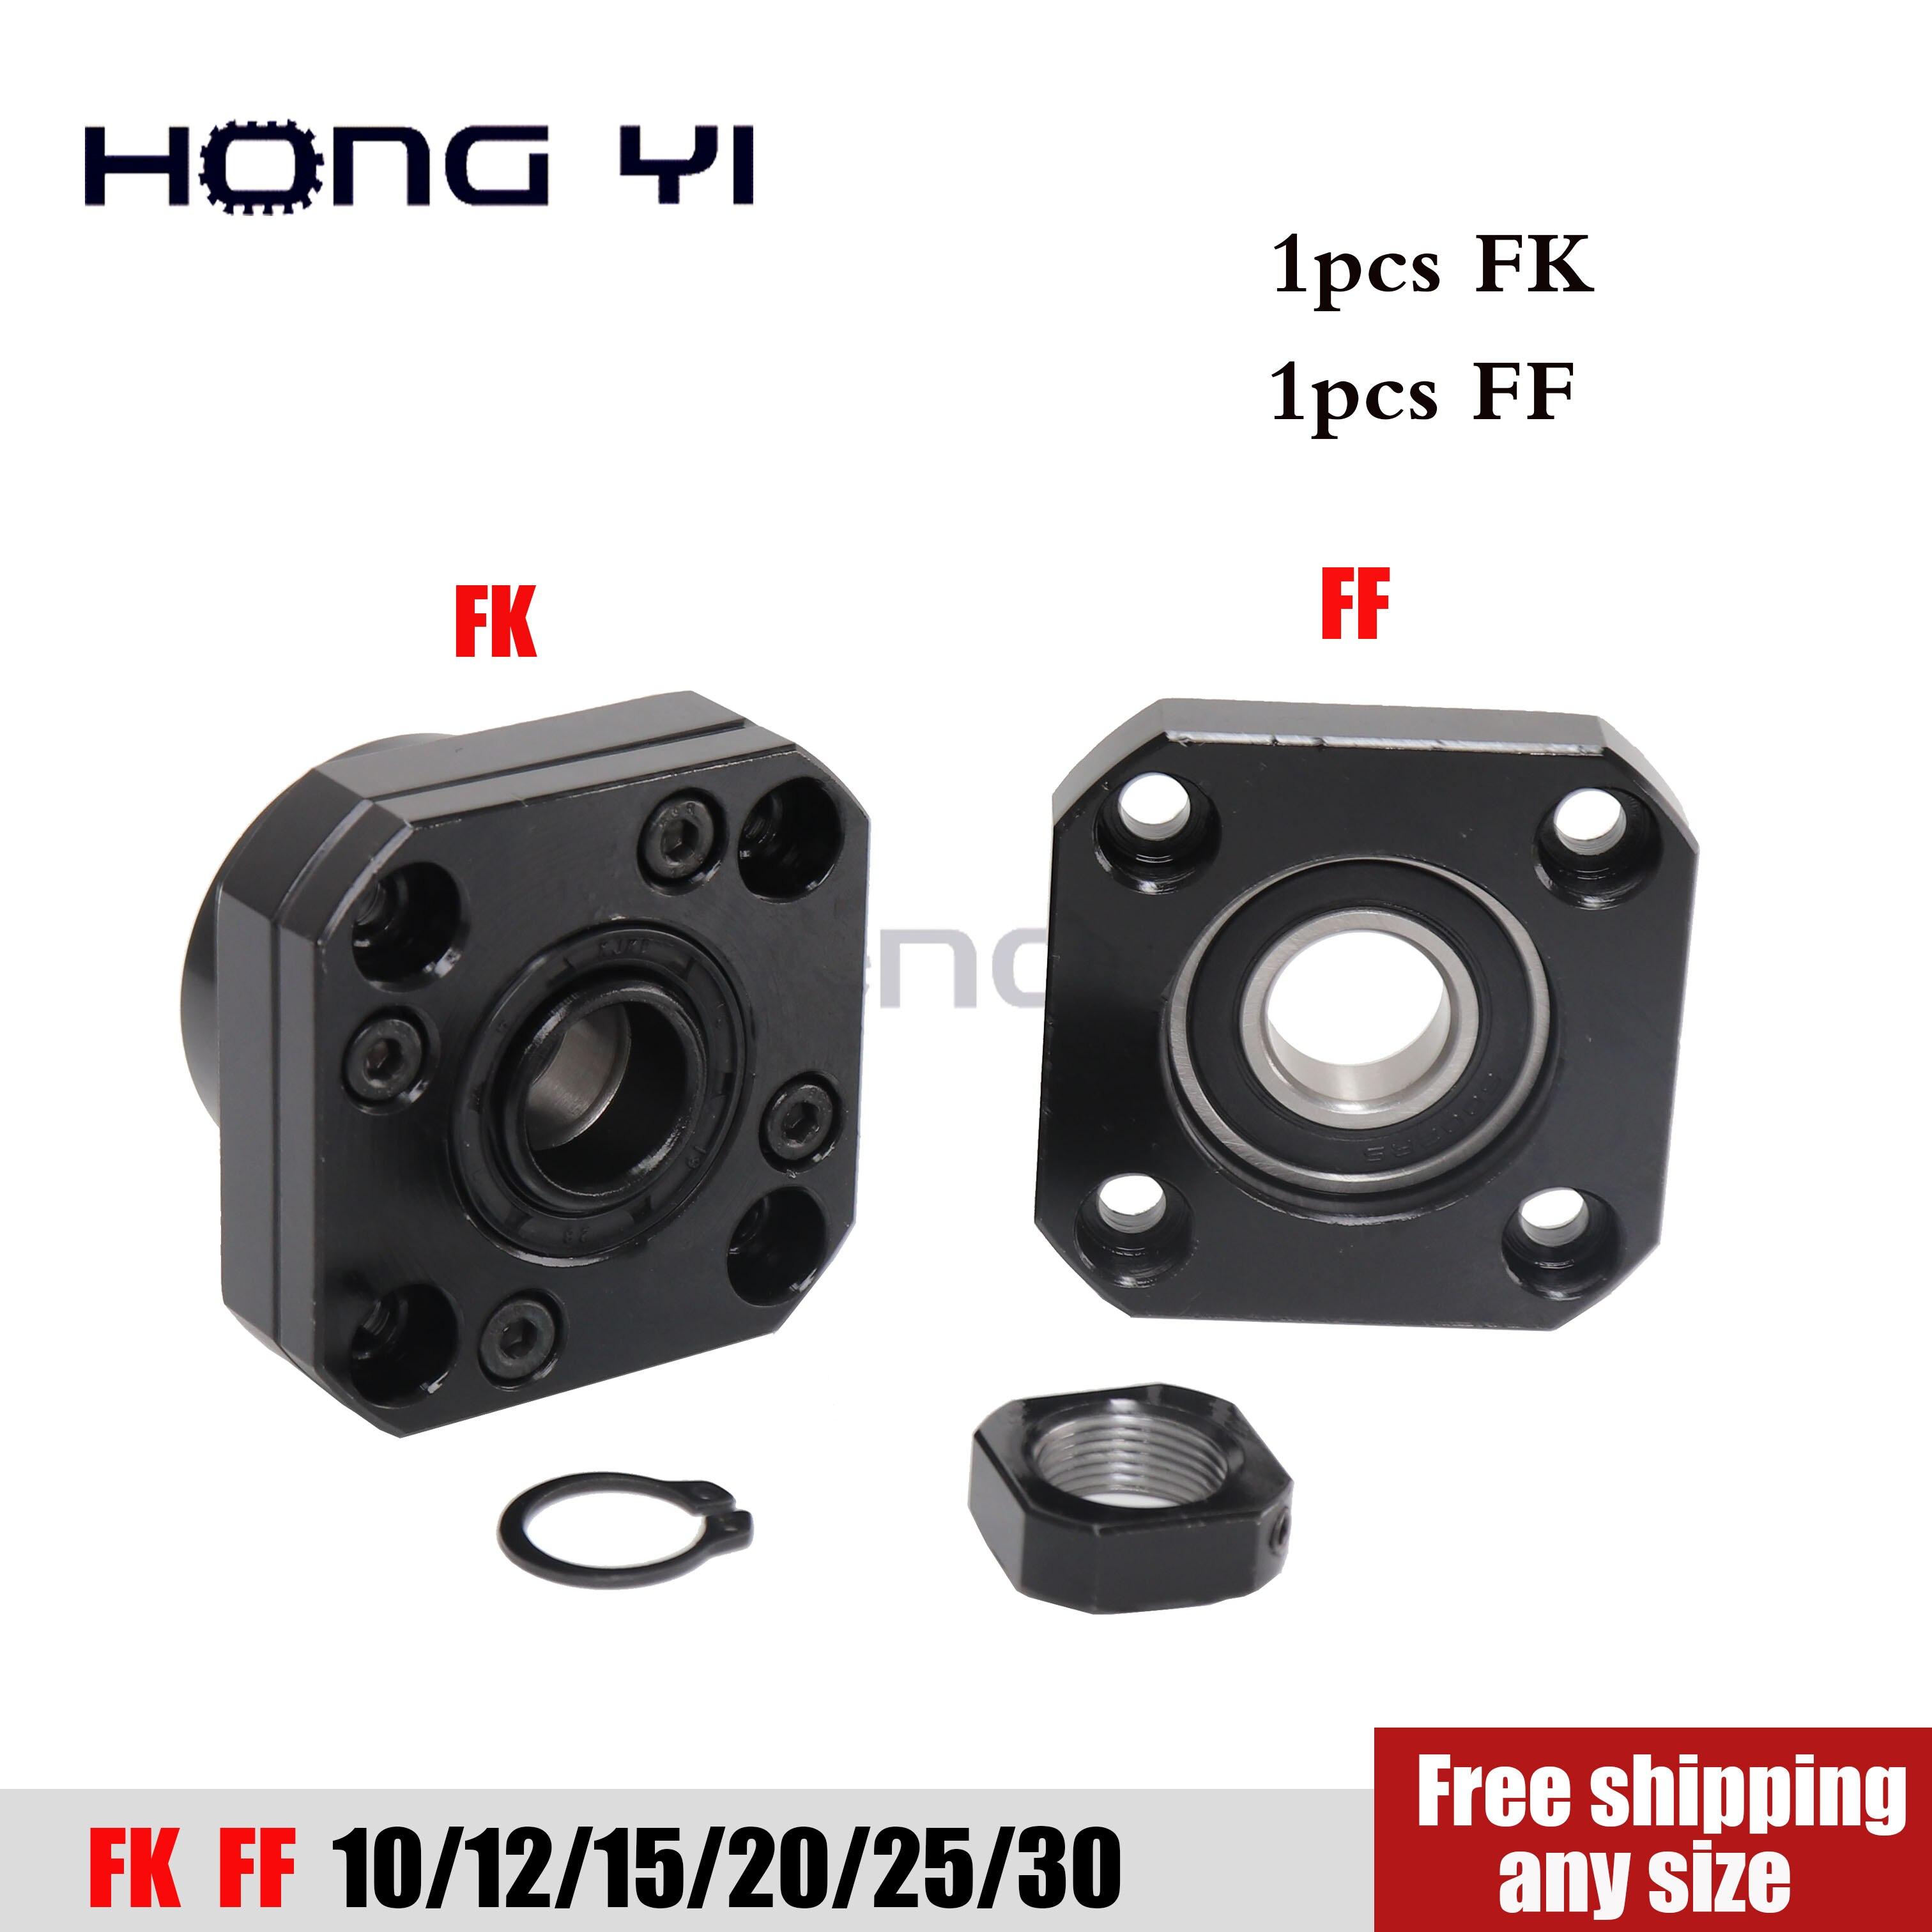 free shipping SFU2005 FK12 FF12 Screw Support Ball Screw End Support for CNC parts for RM1204 SFU1605 FK10 FK15 FK20 FF12